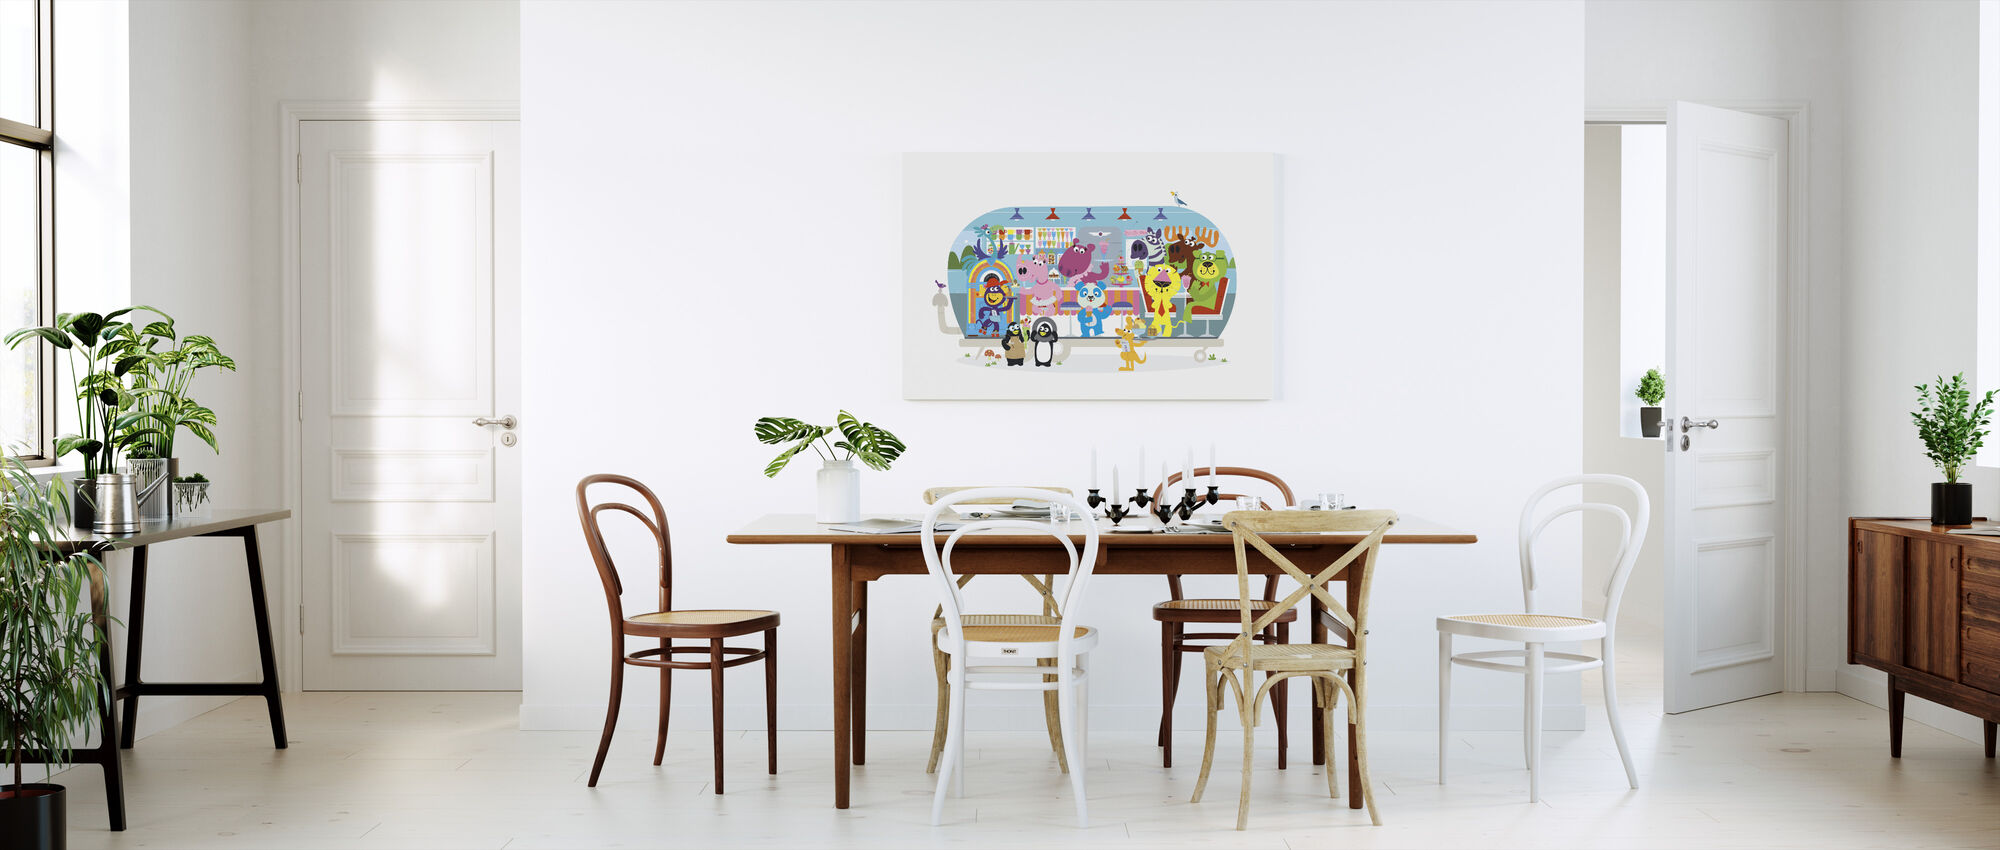 Hauskan rakastava Betsys Hippo Hop Diner - Canvastaulu - Keittiö